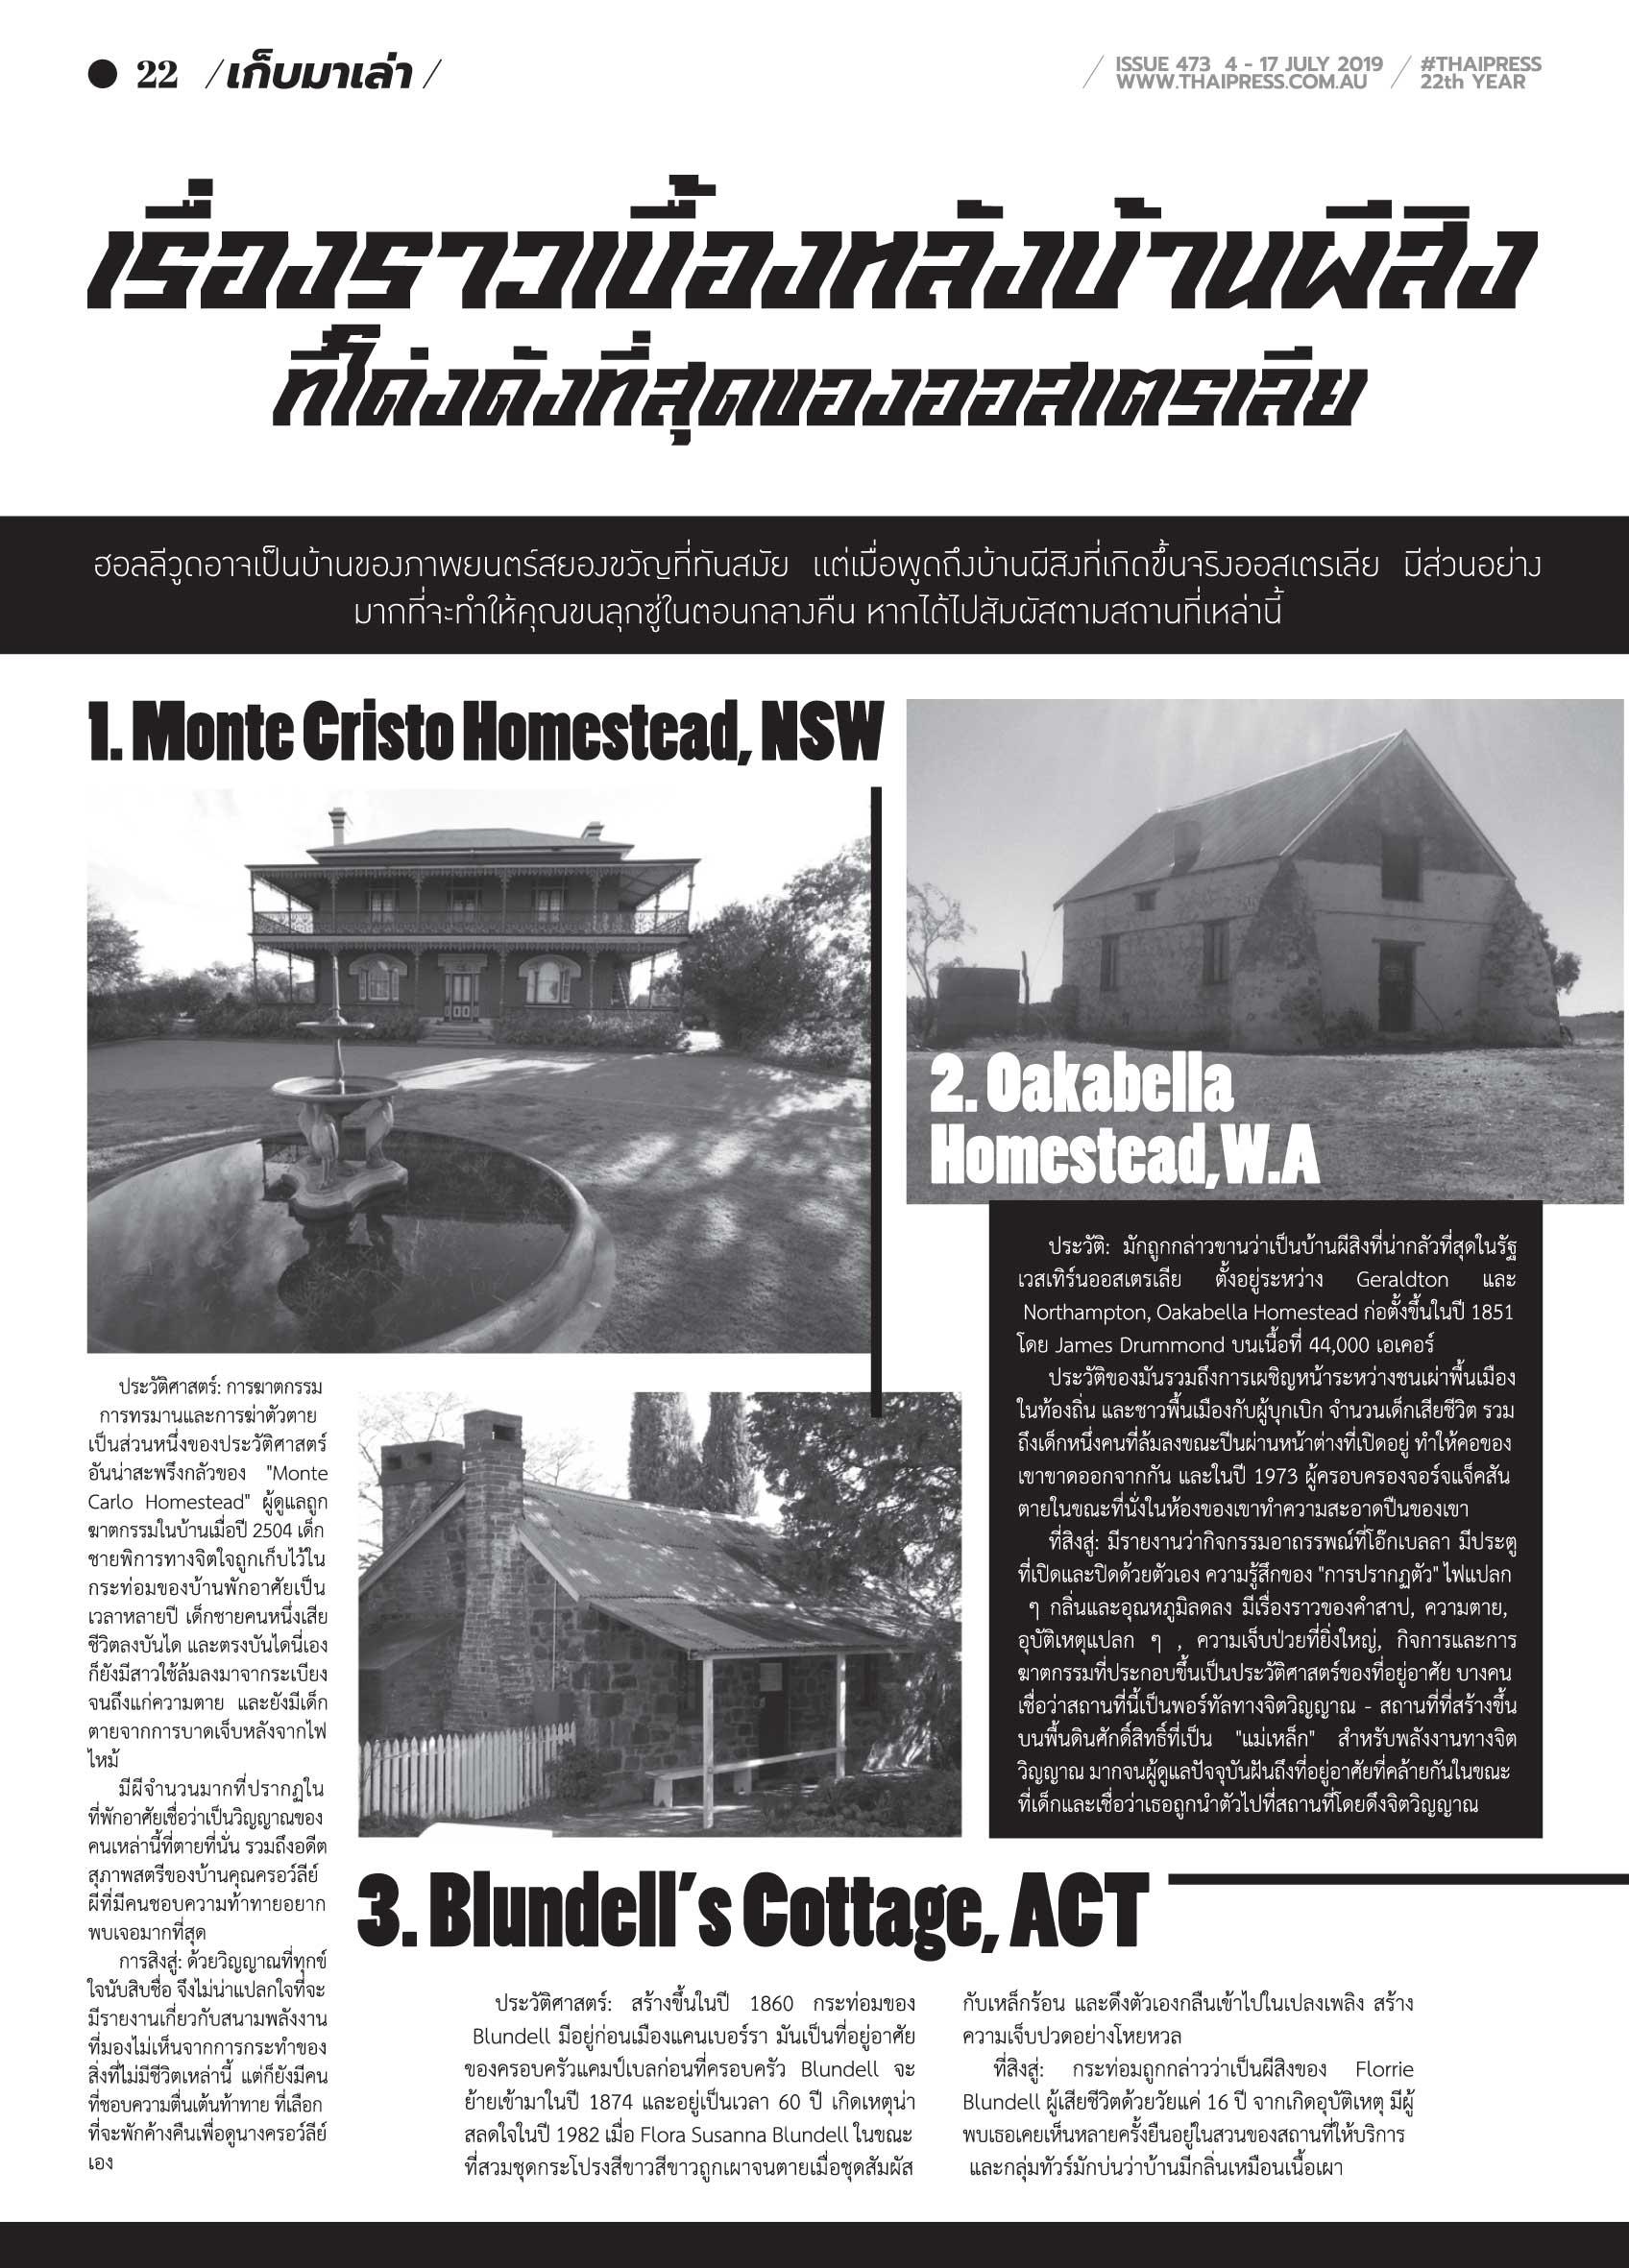 thaipress newspaper in Australia